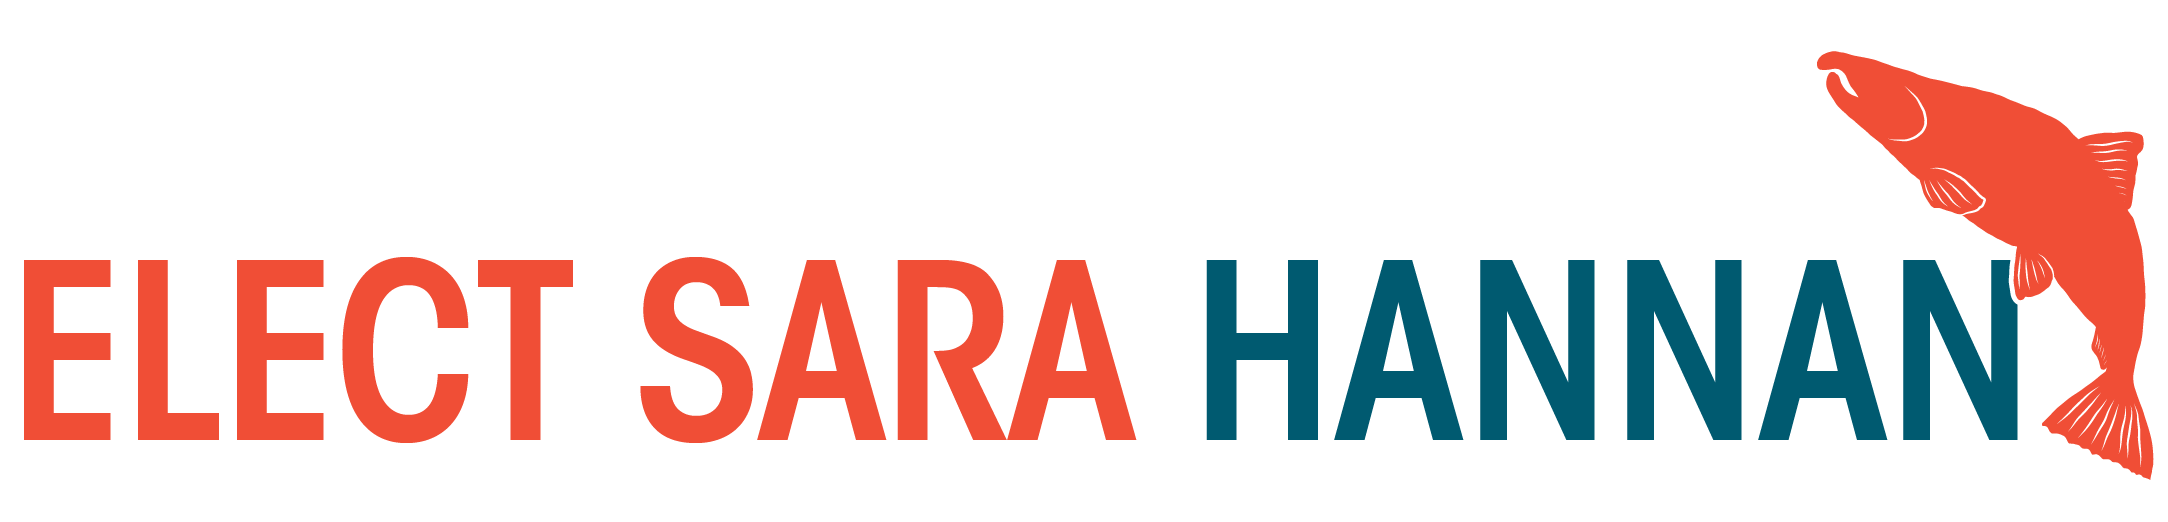 Sara Hannan